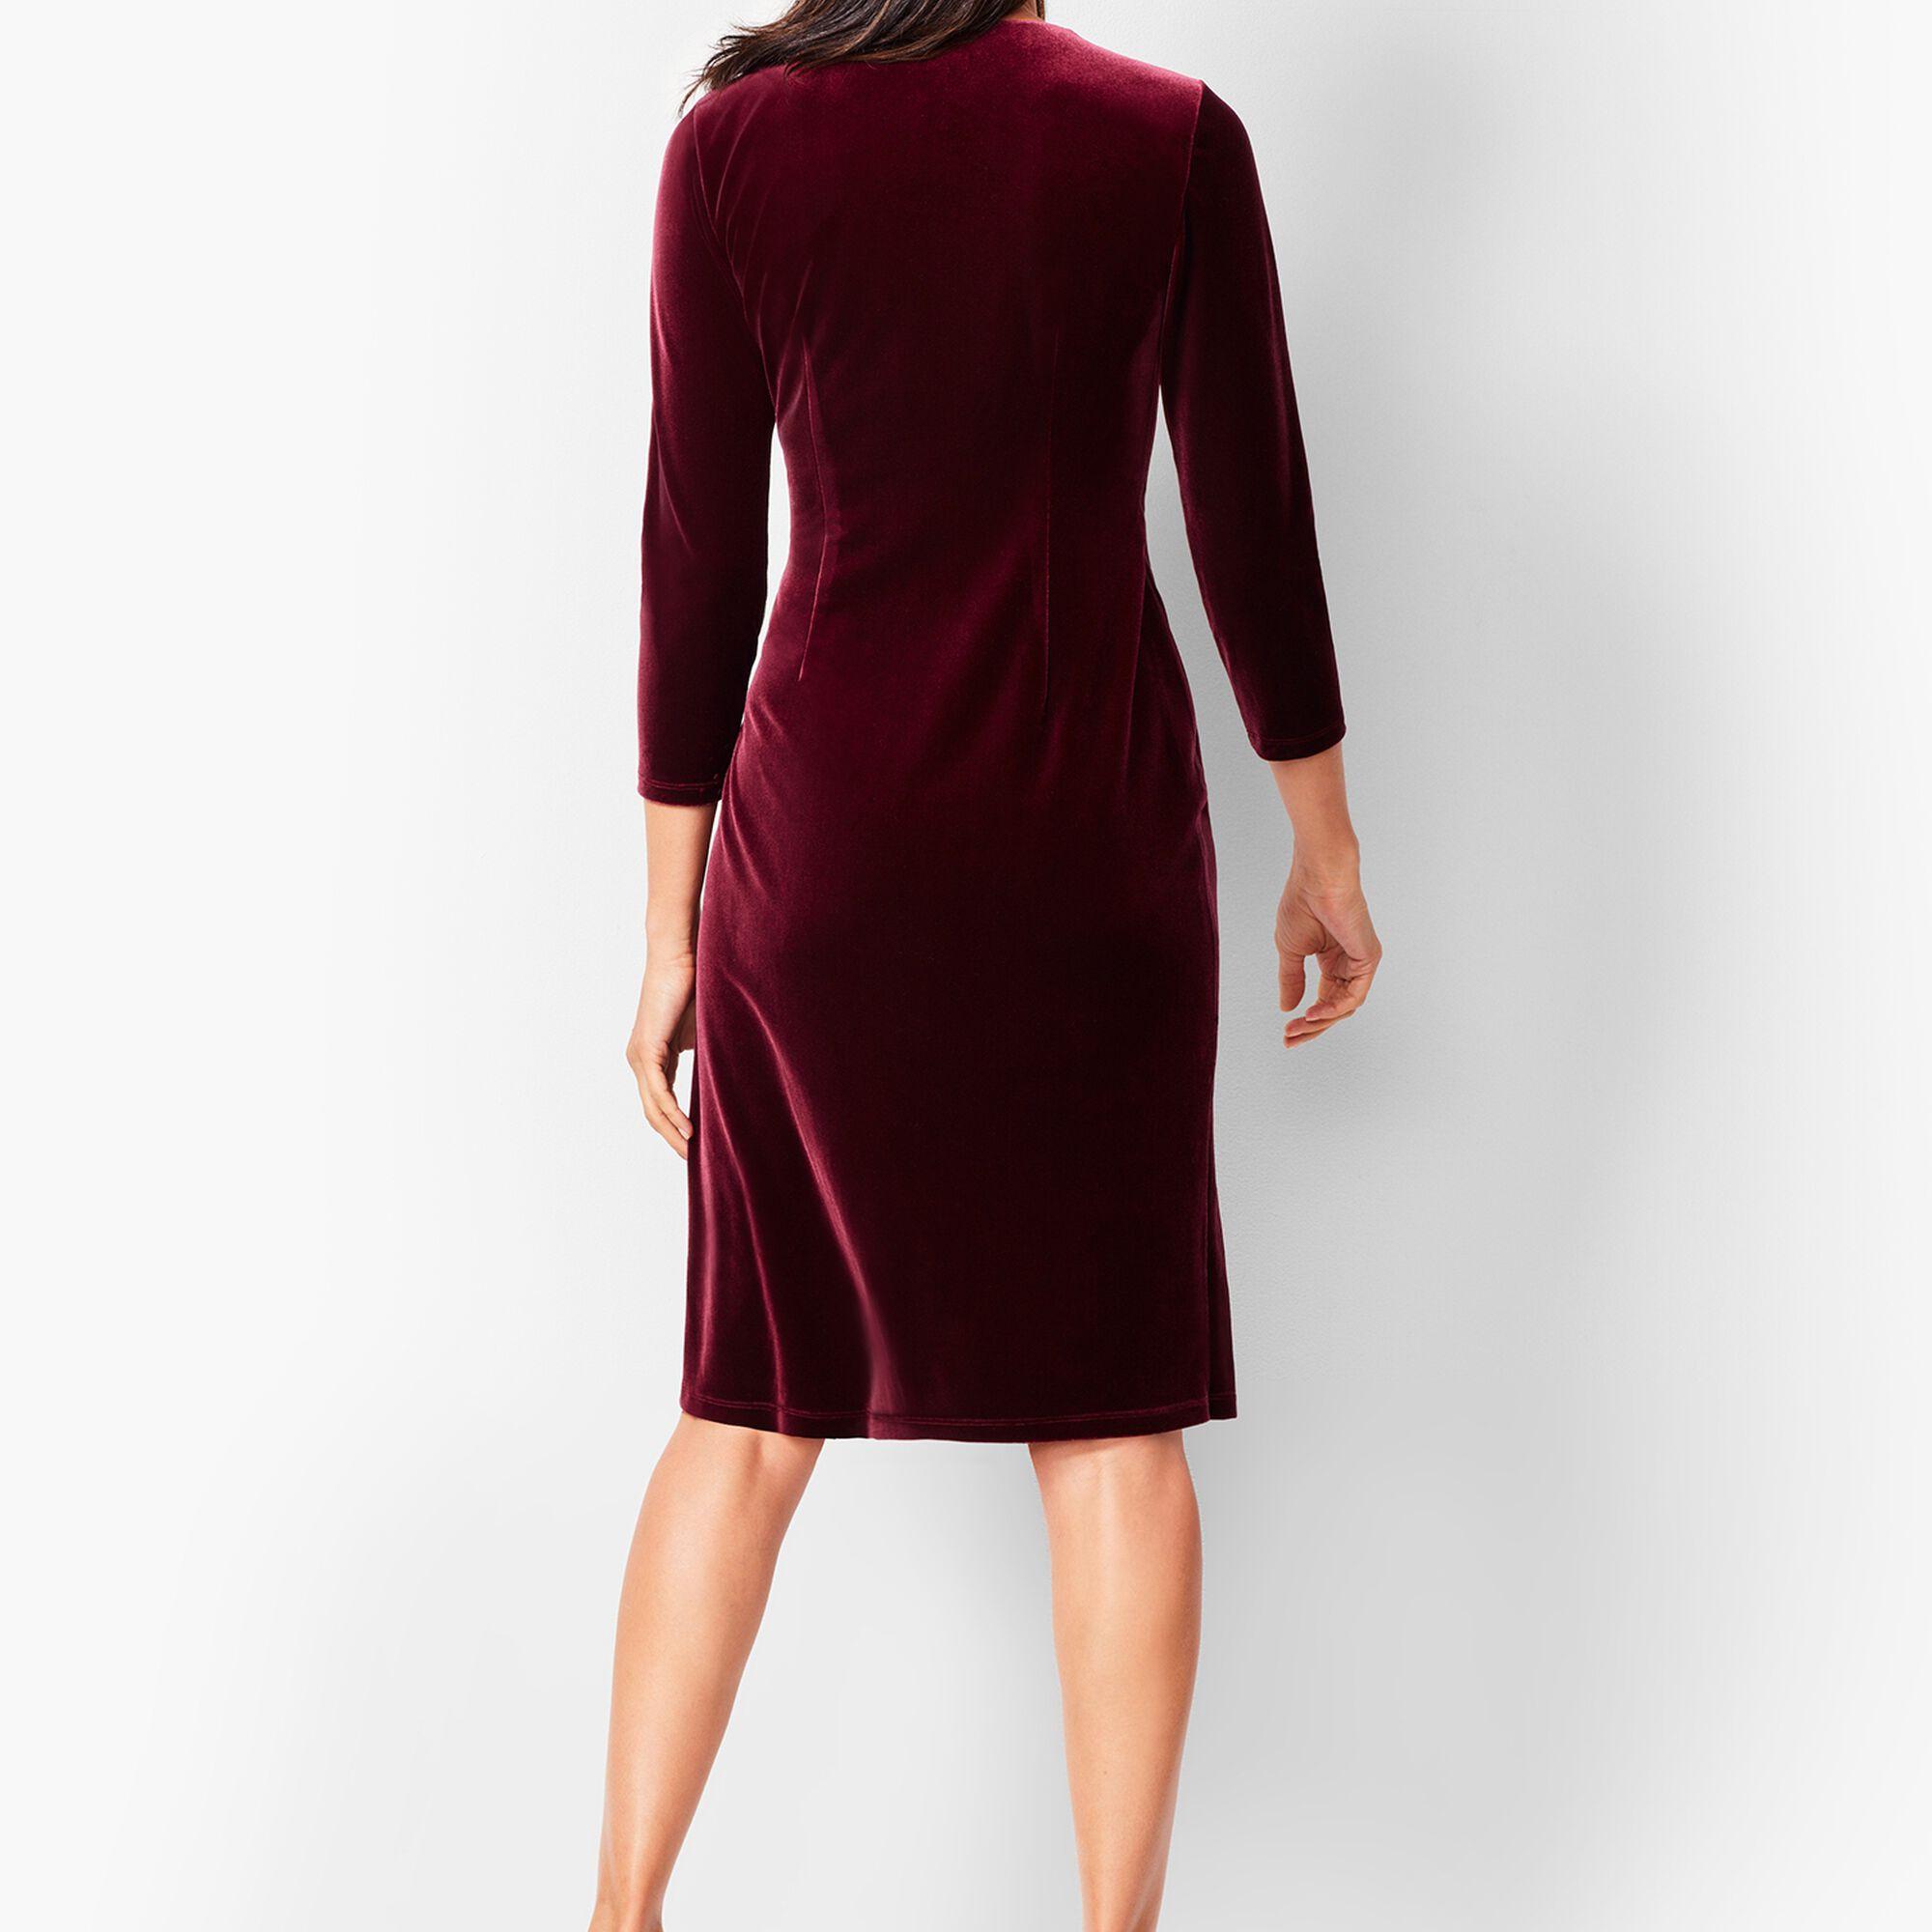 9ca23a0ad3 Velvet Faux-Wrap Sheath Dress Opens a New Window.